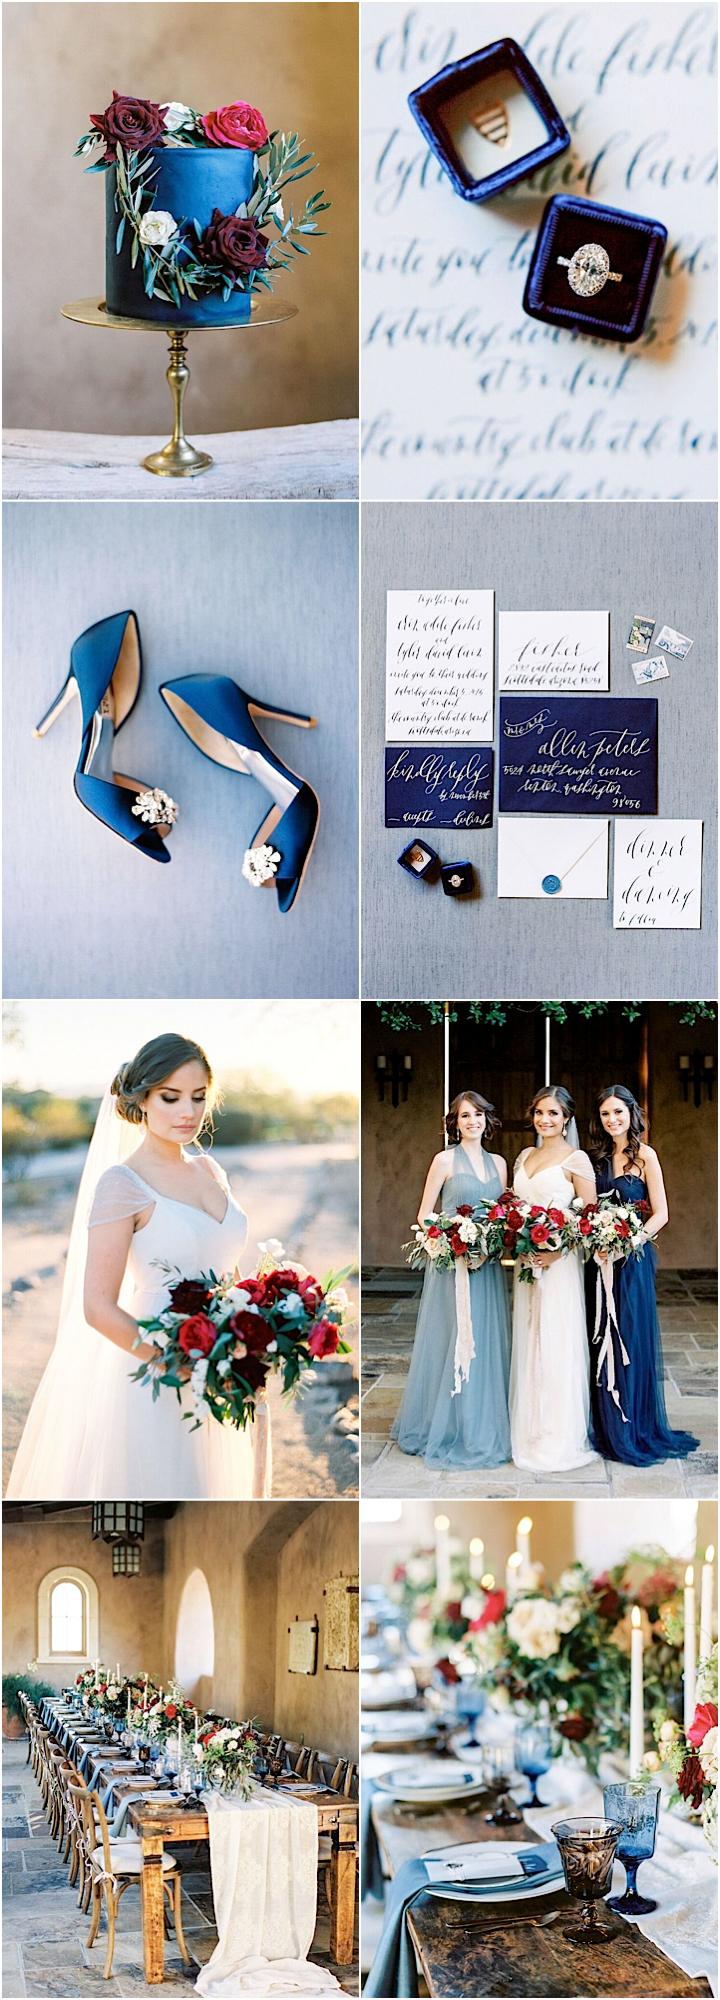 Arizona Wedding in Beautiful Shades of Blue